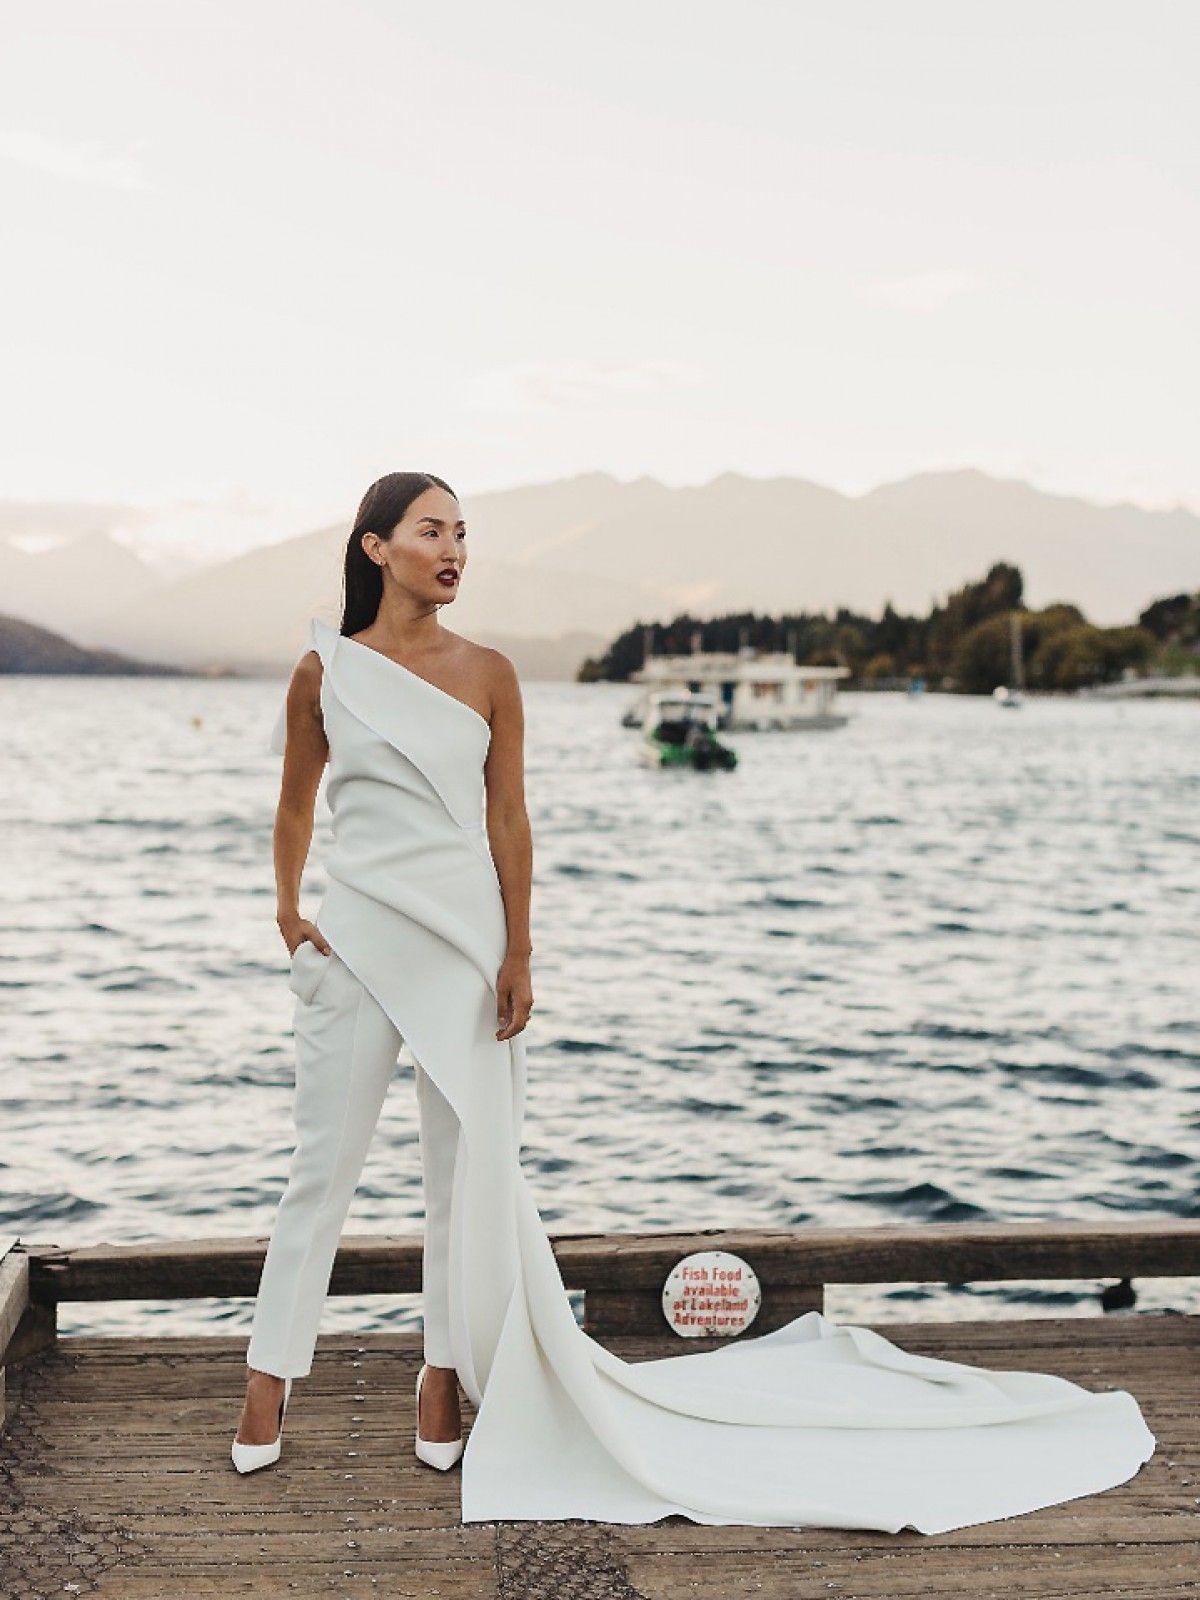 2019 Nicole Warne nude photos 2019